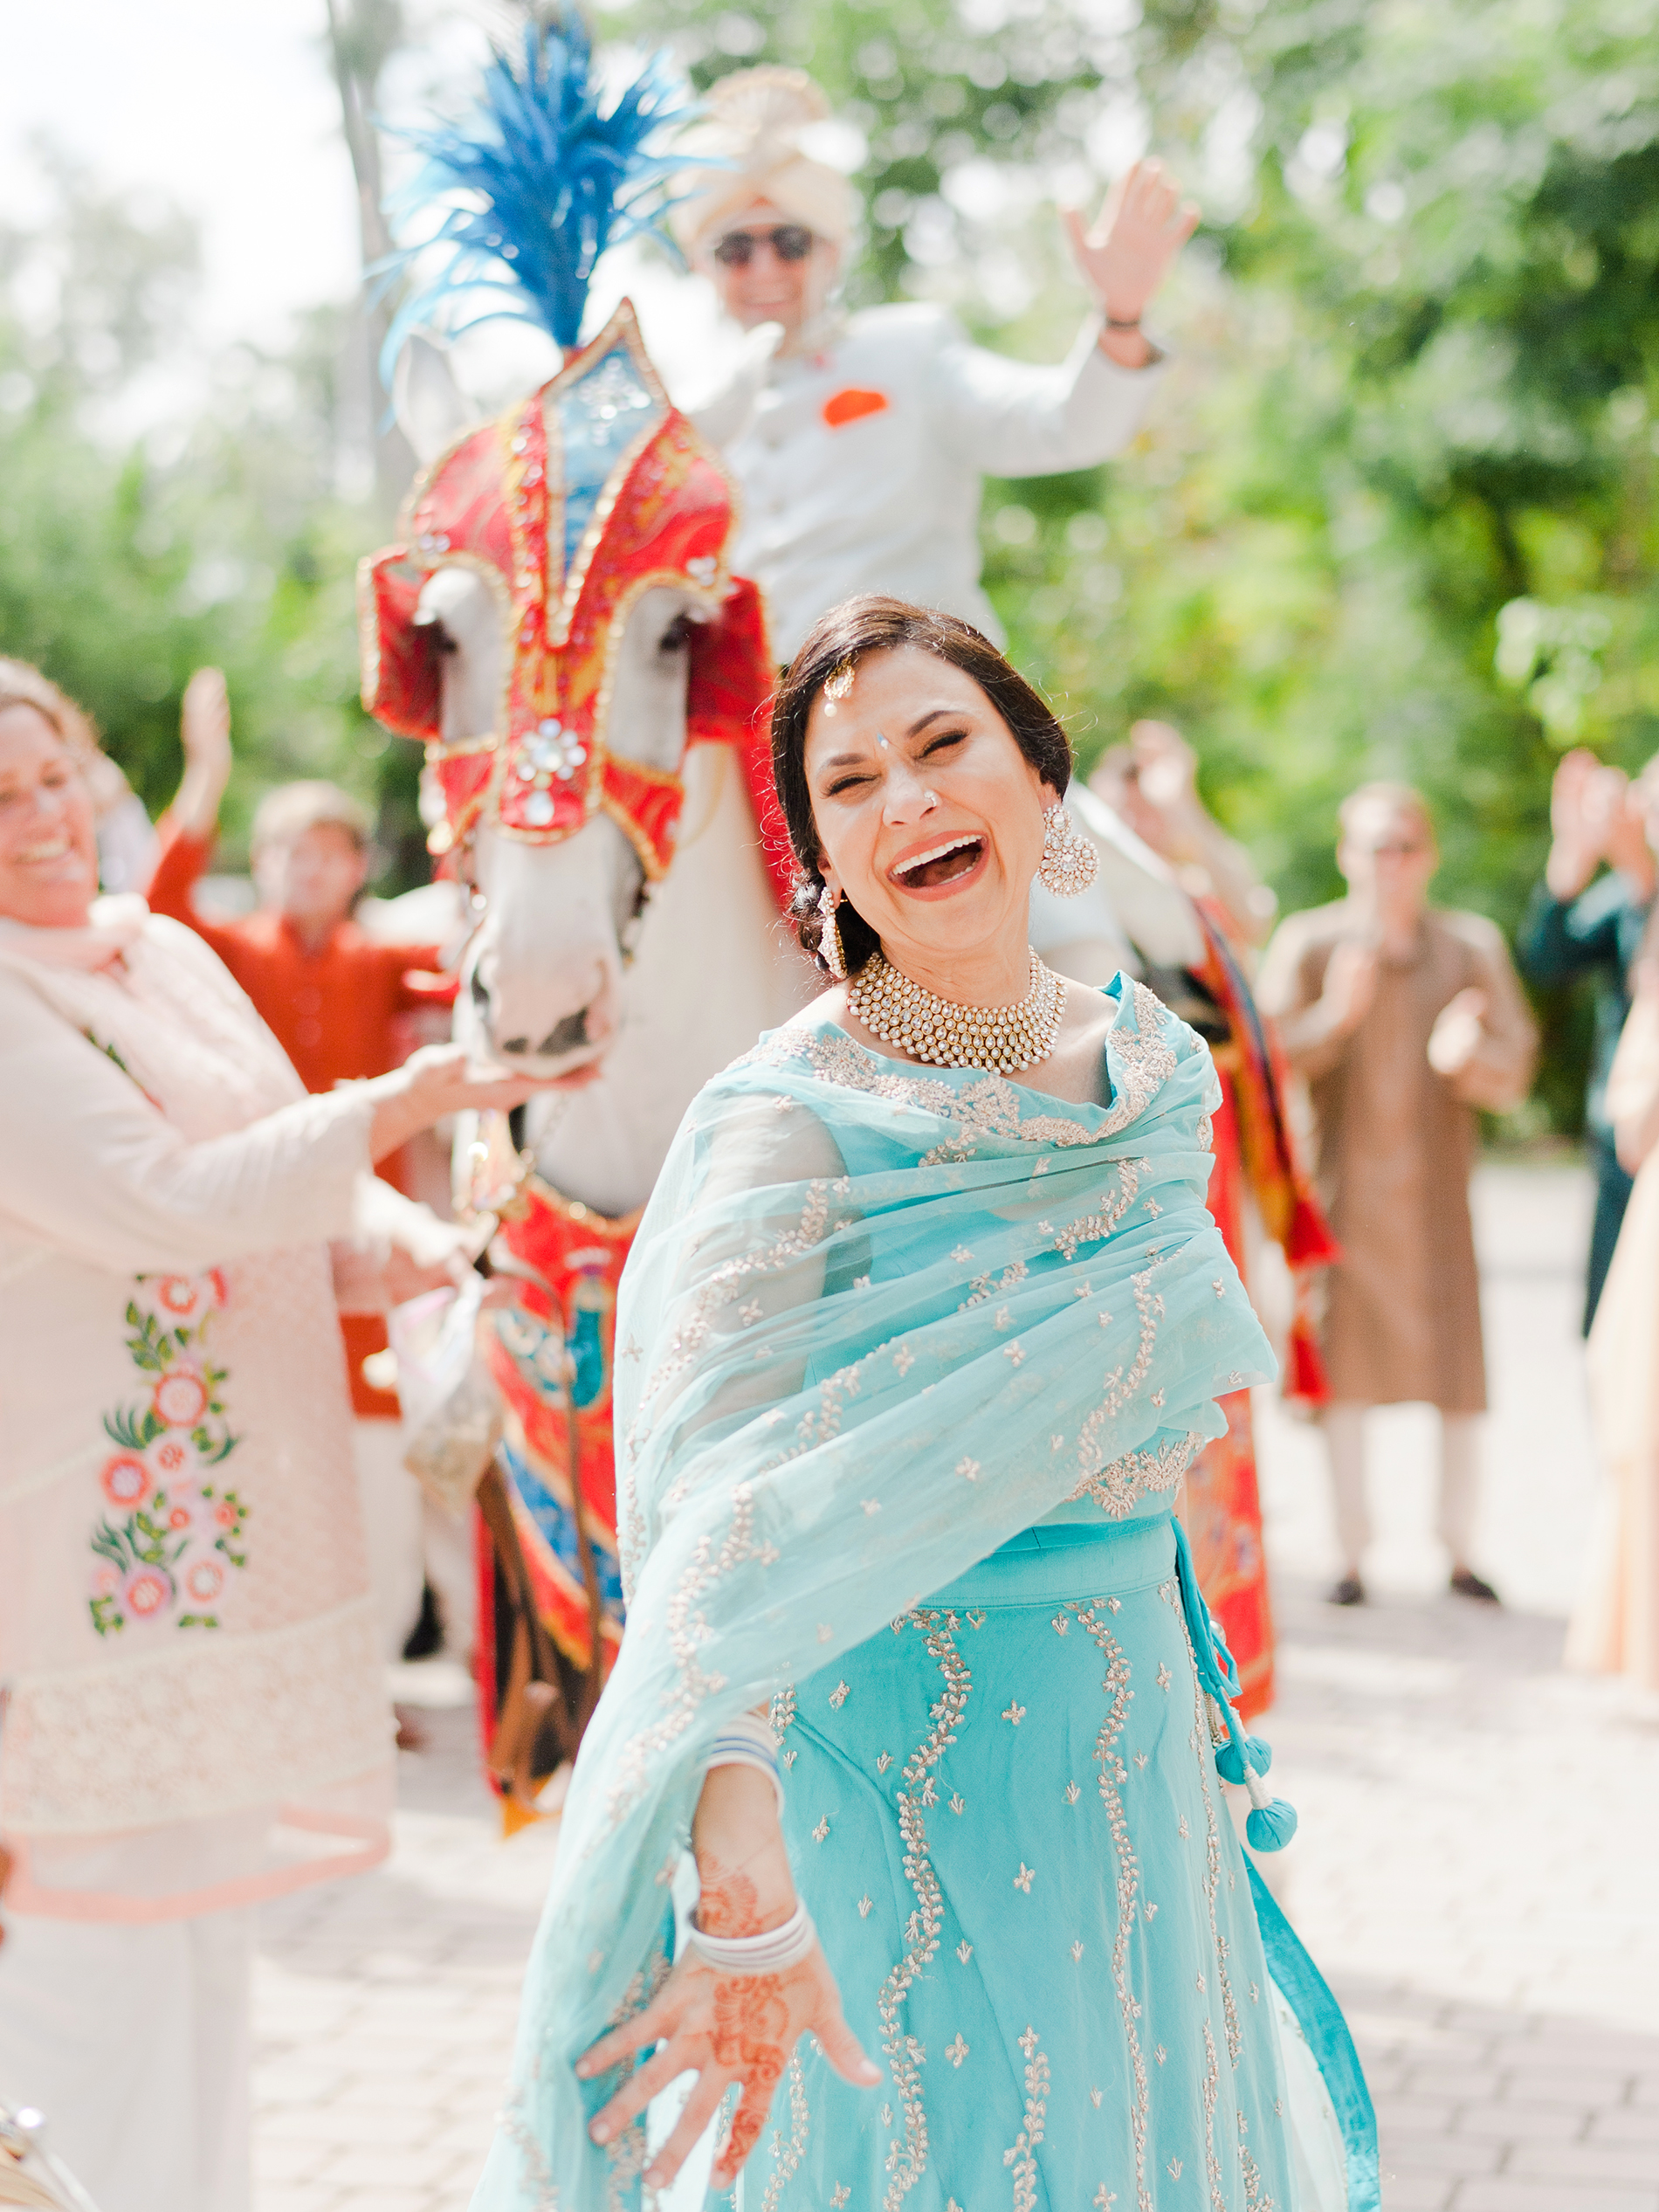 anuja nikhil wedding baraat